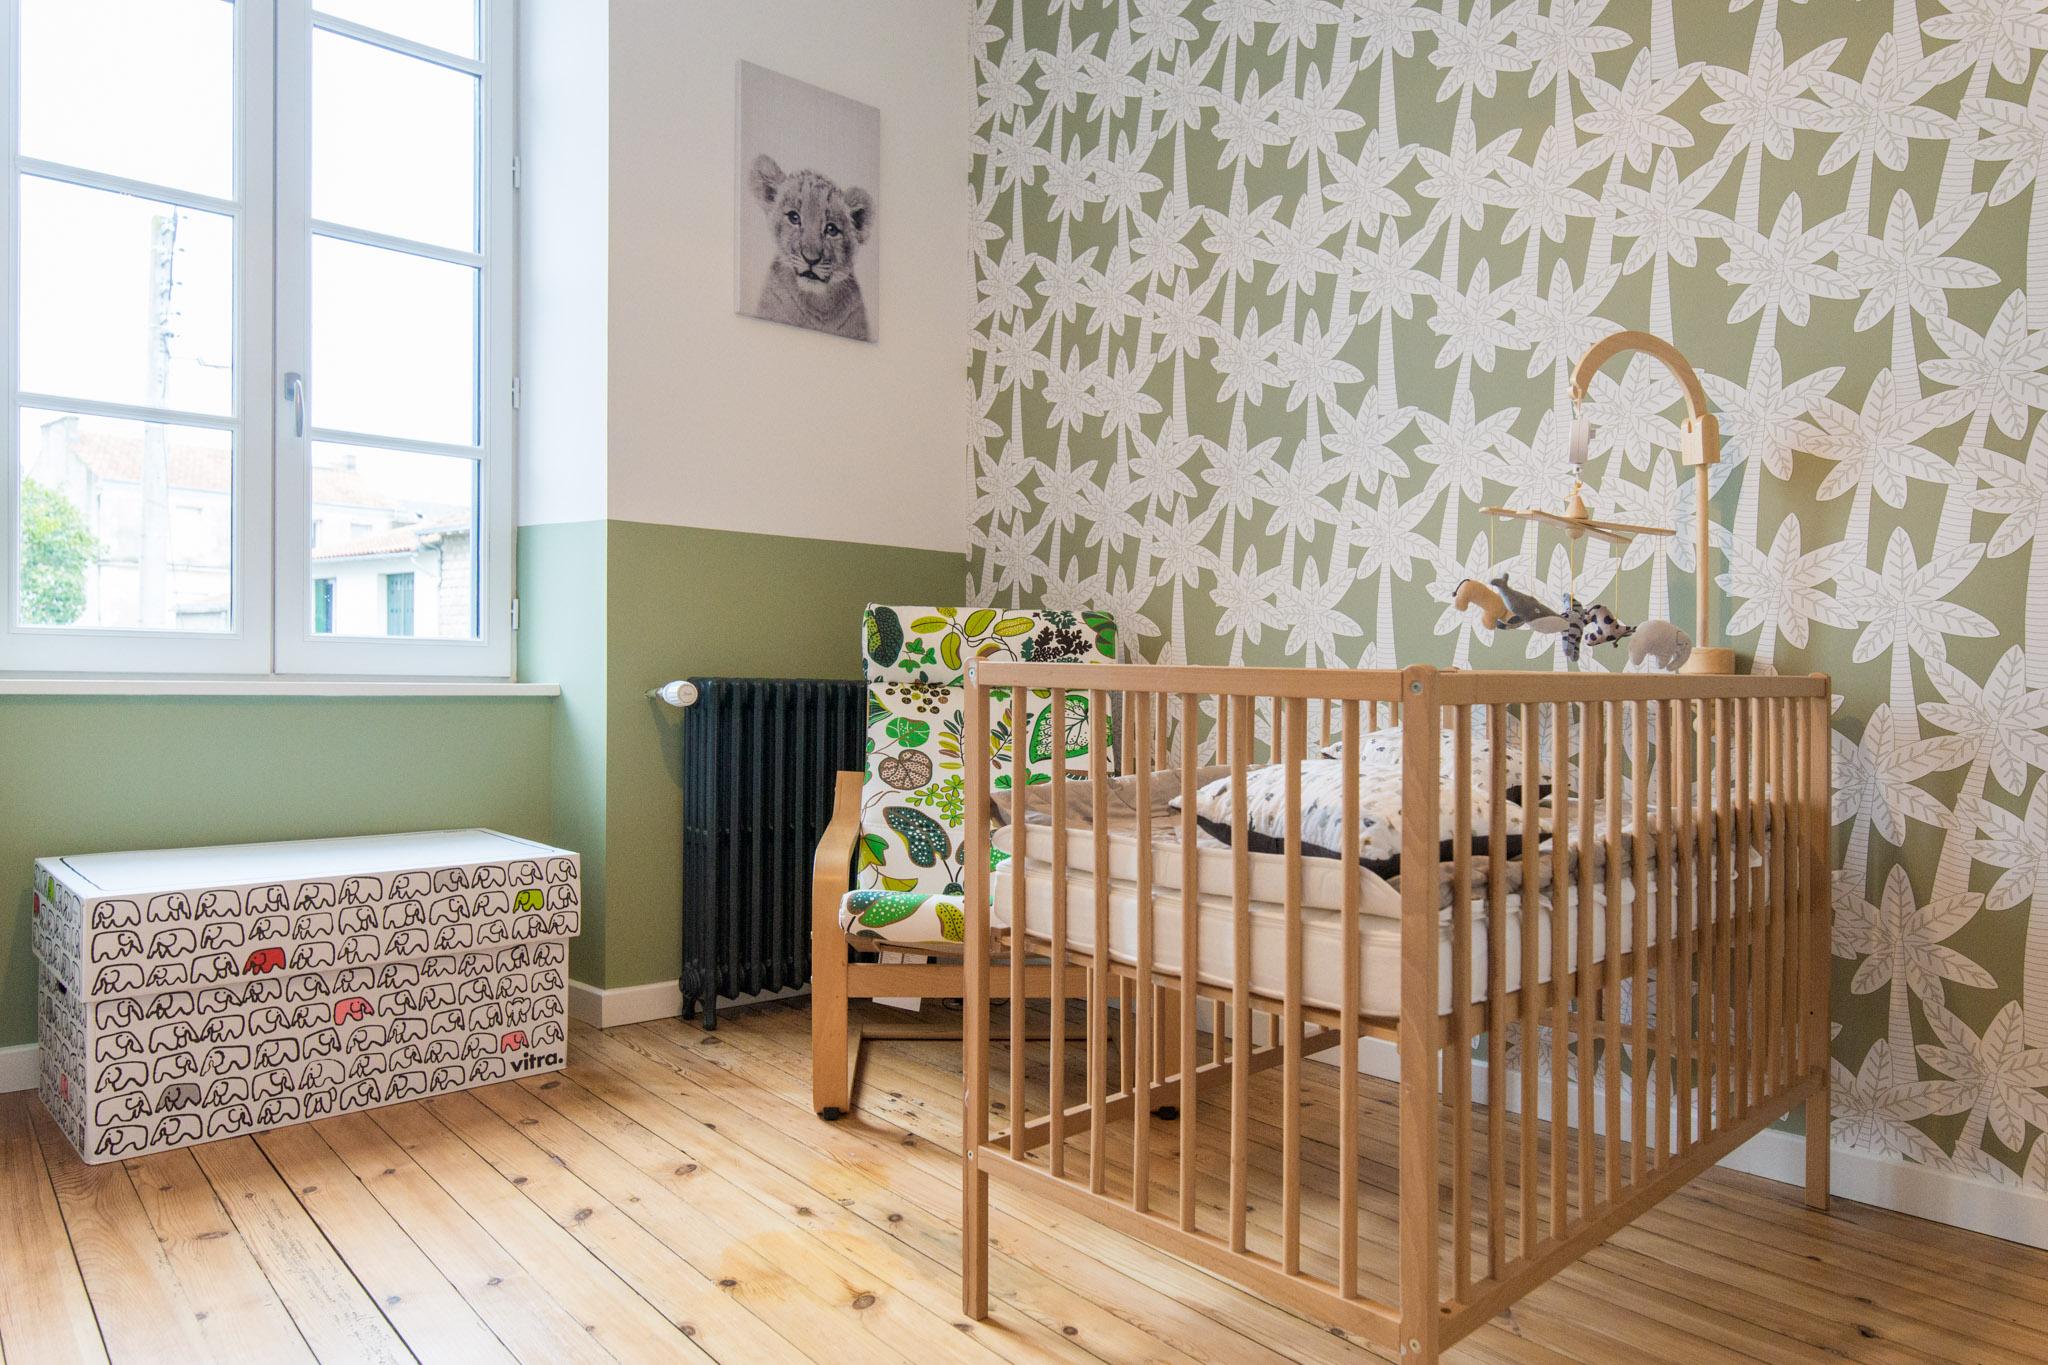 renovation amenagement decoration ameublement agencement. Black Bedroom Furniture Sets. Home Design Ideas